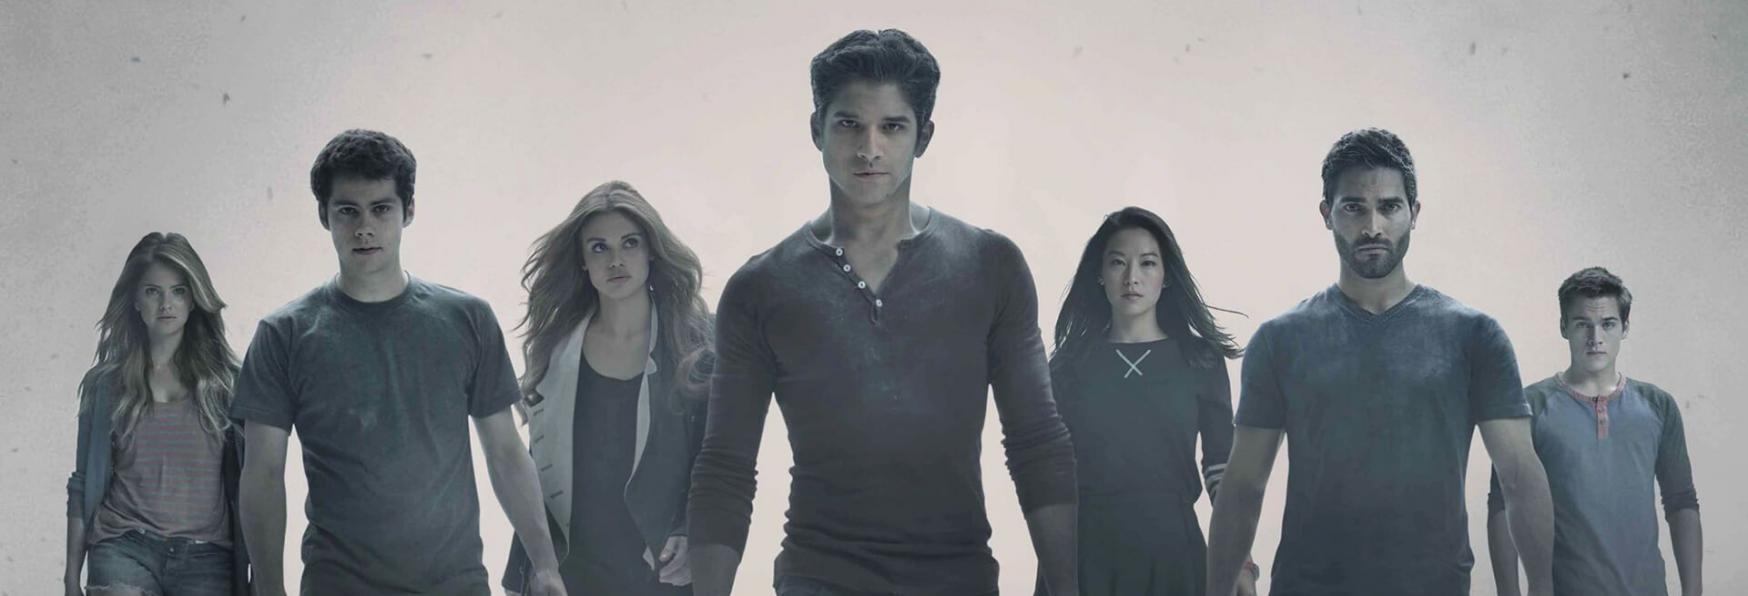 Teen Wolf: Paramount+ al lavoro su un Film Revival della Serie TV